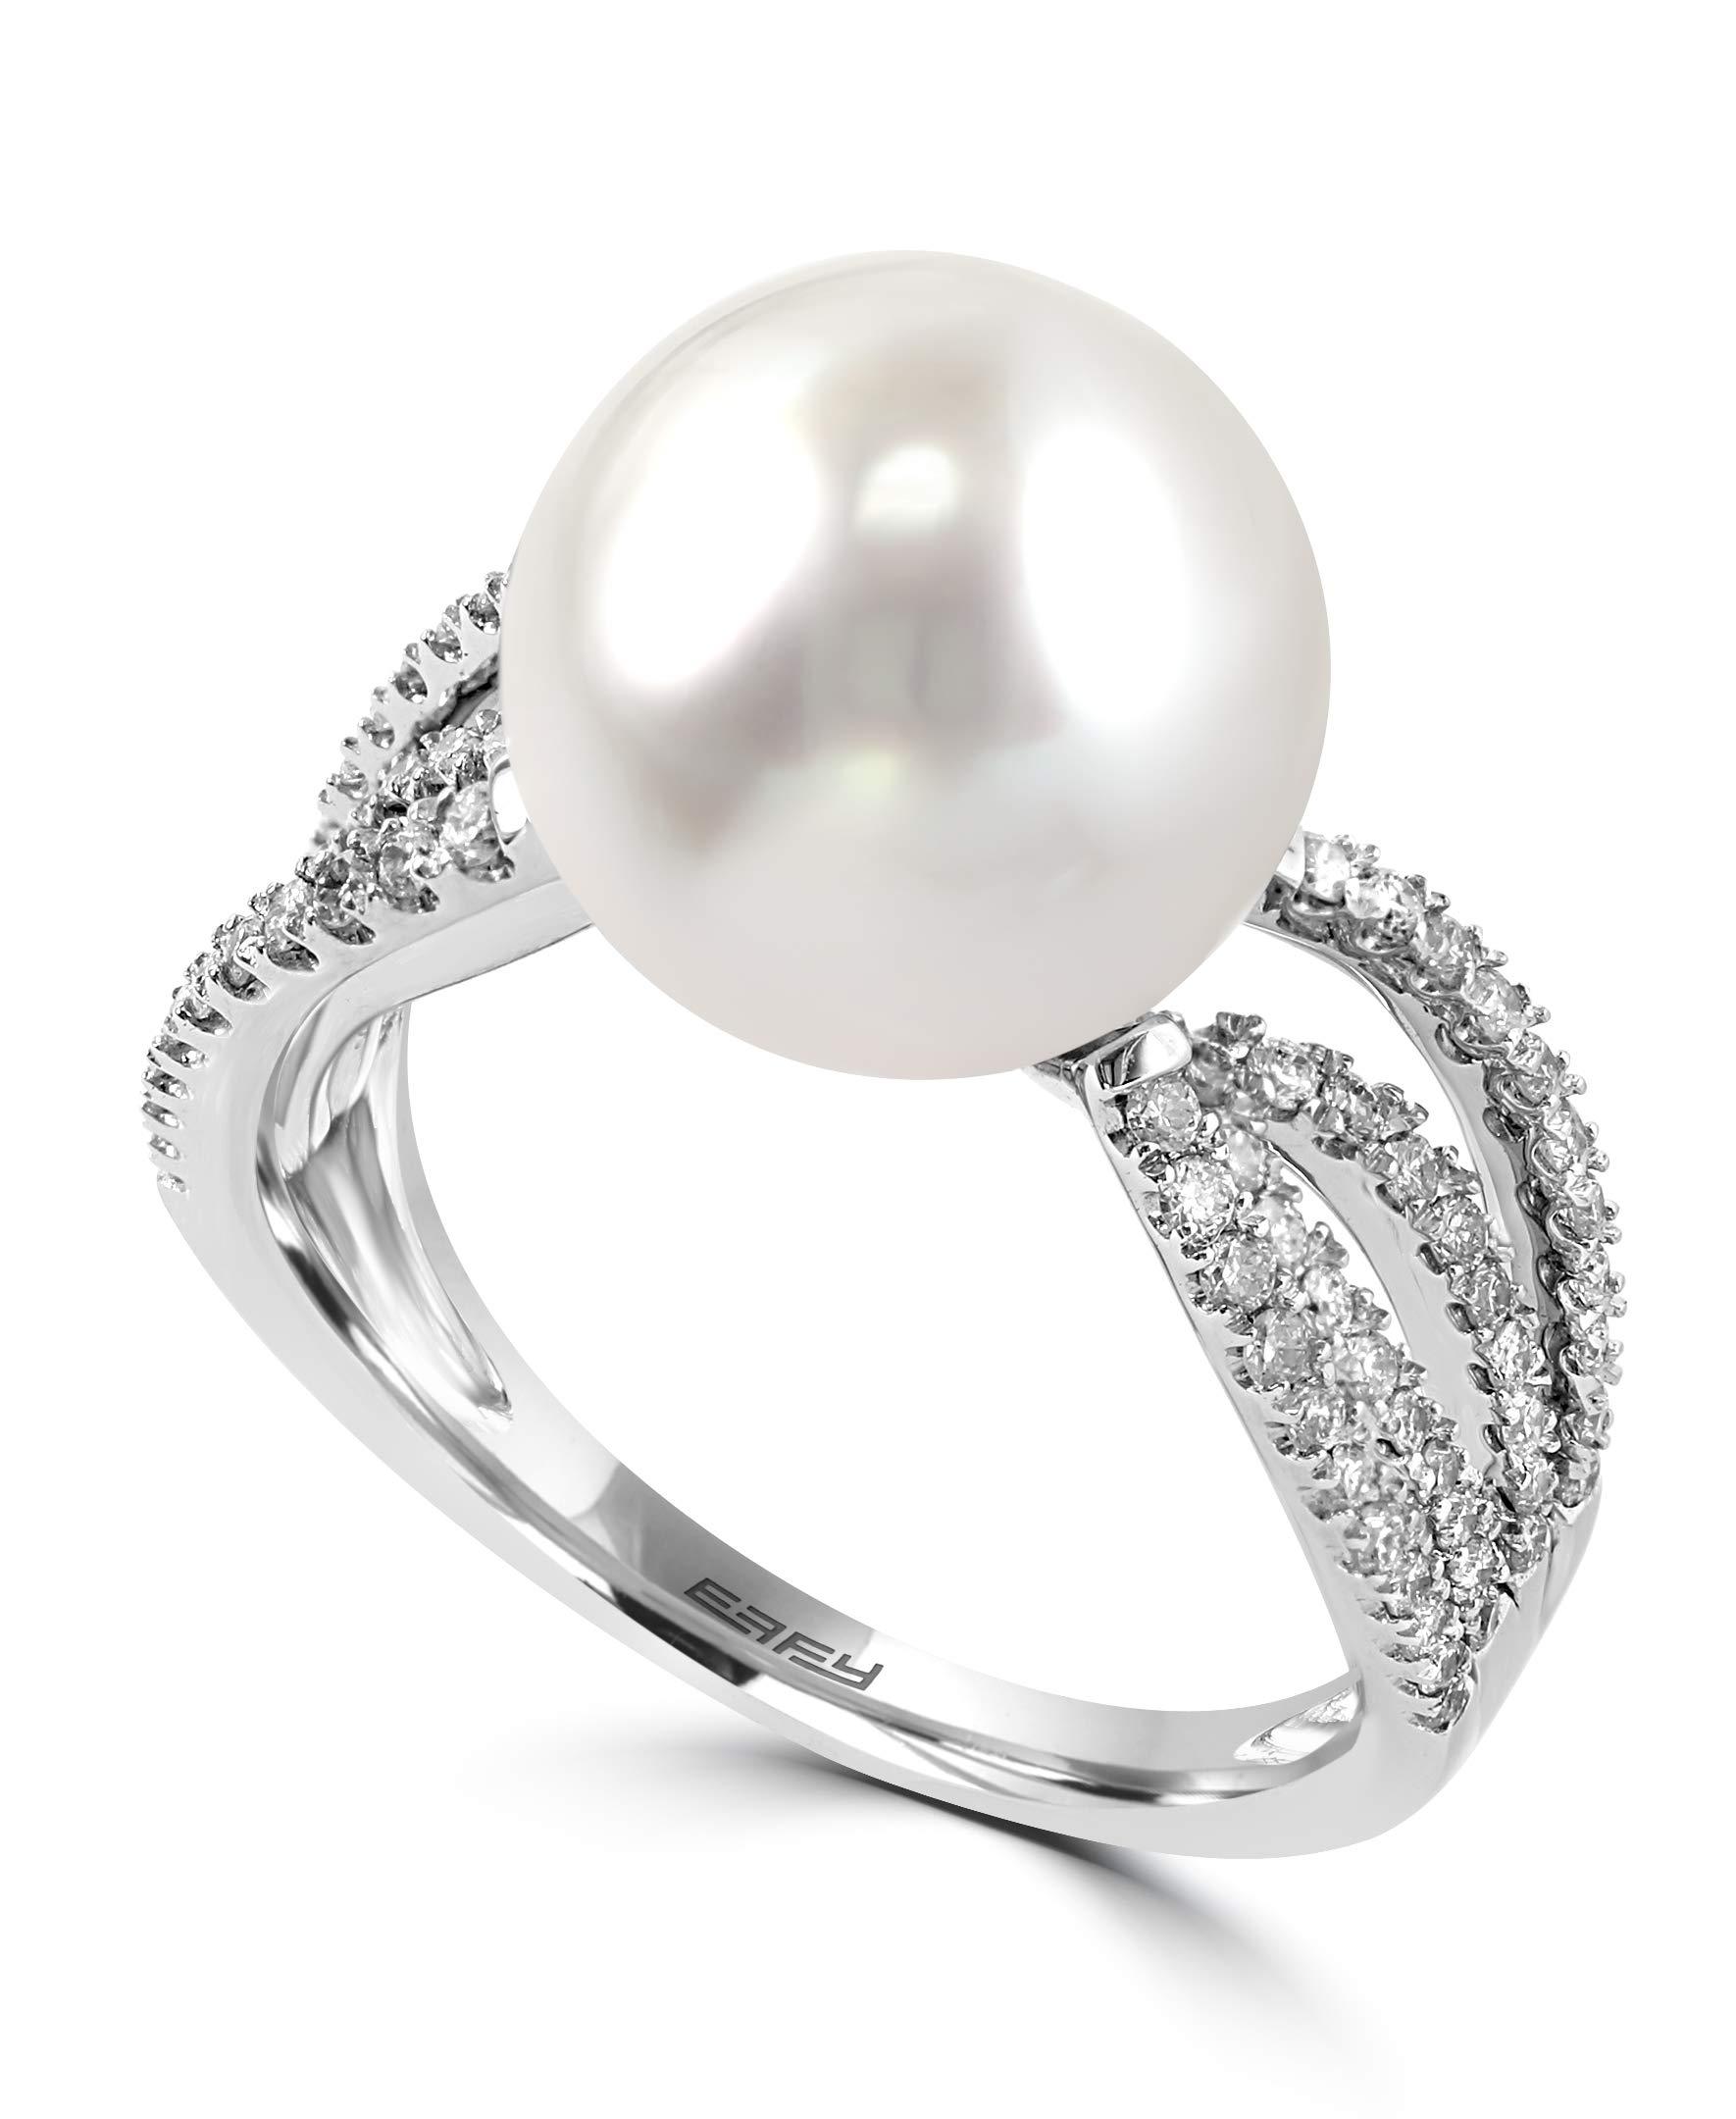 Effy Pearl South Sea Pearl (11-12mm) & Diamond (1/2 ct. t.w.) Ring by Effy